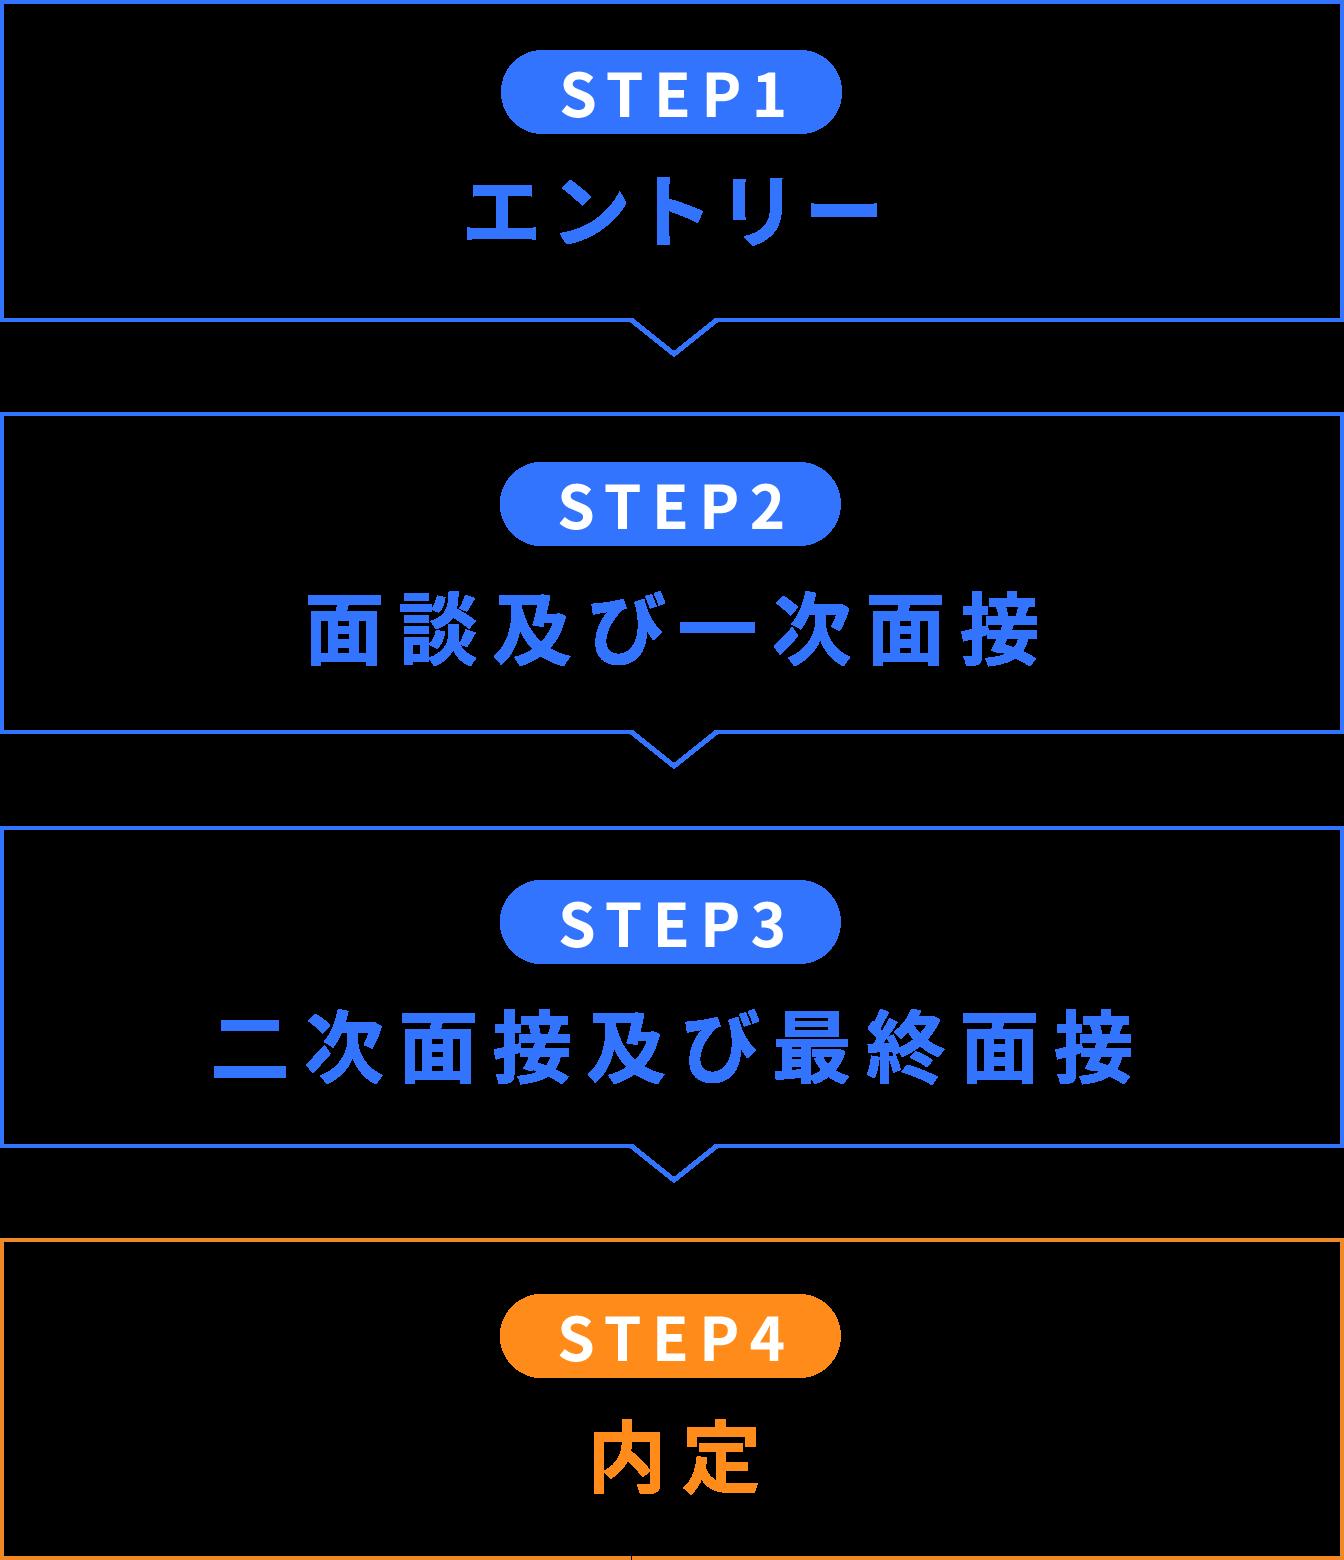 エントリー→面接及び一次面接→二次面接及び最終面接→内定